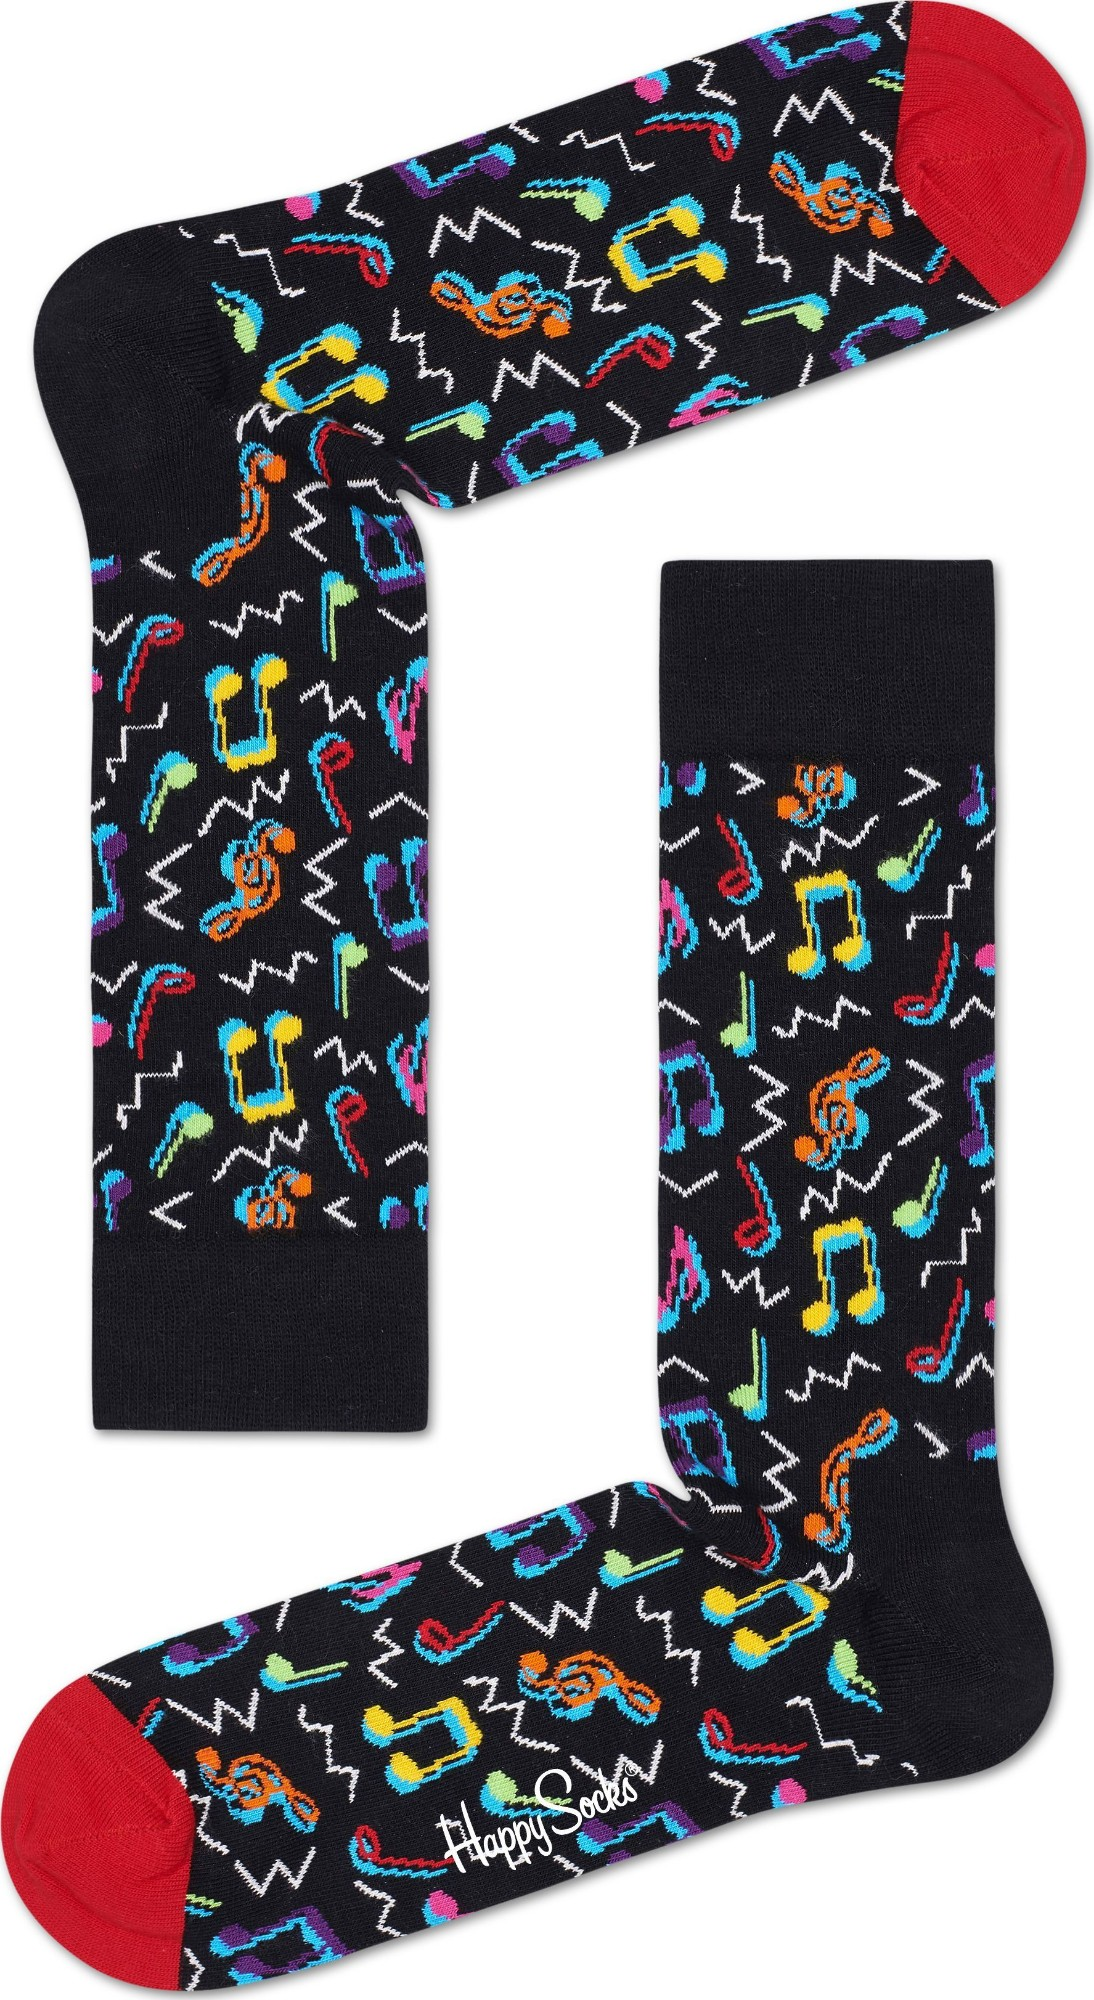 Happy Socks City Jazz Multi 9300 36-40